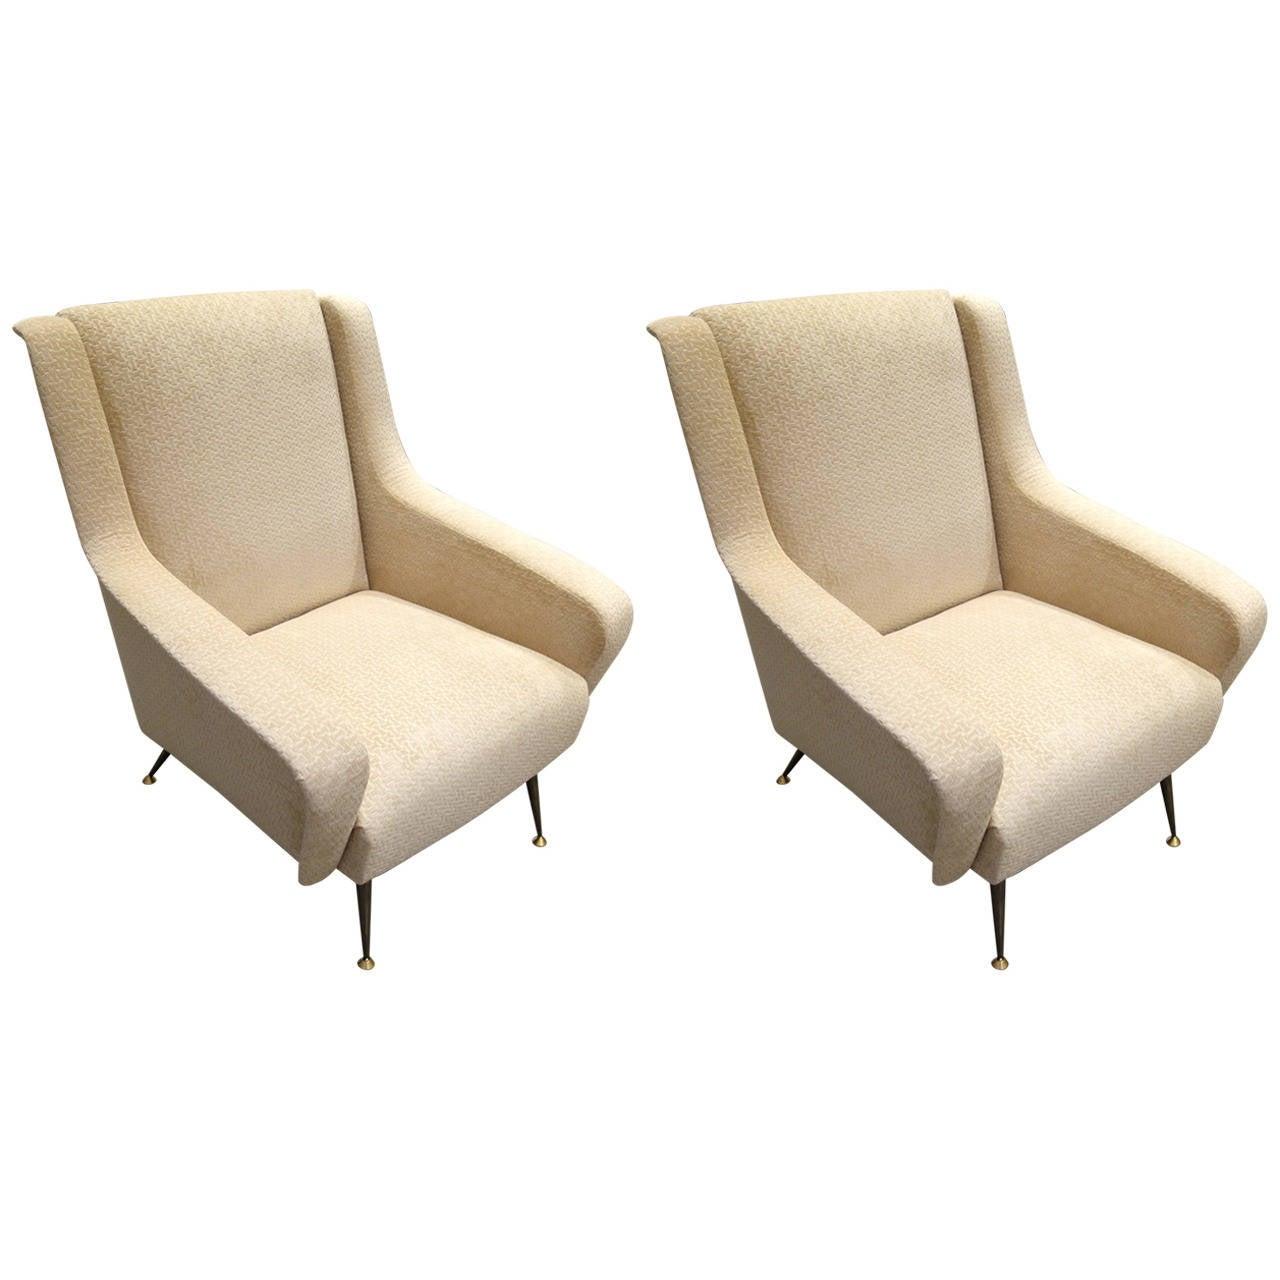 Pair of Mid-Century Modern Italian Sculptural Lounge ...